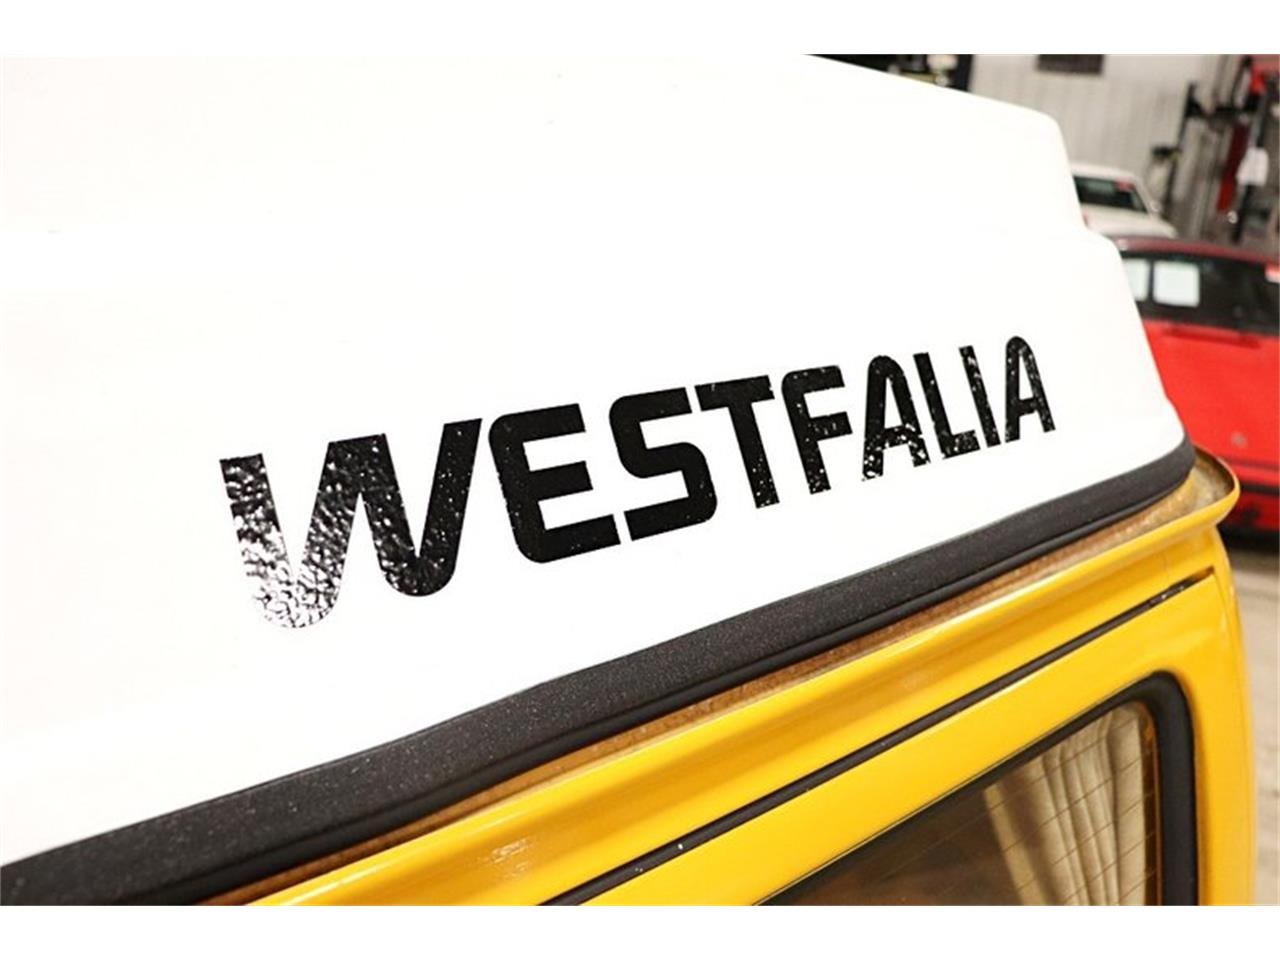 Large Picture of '76 Volkswagen Westfalia Camper - PVOS